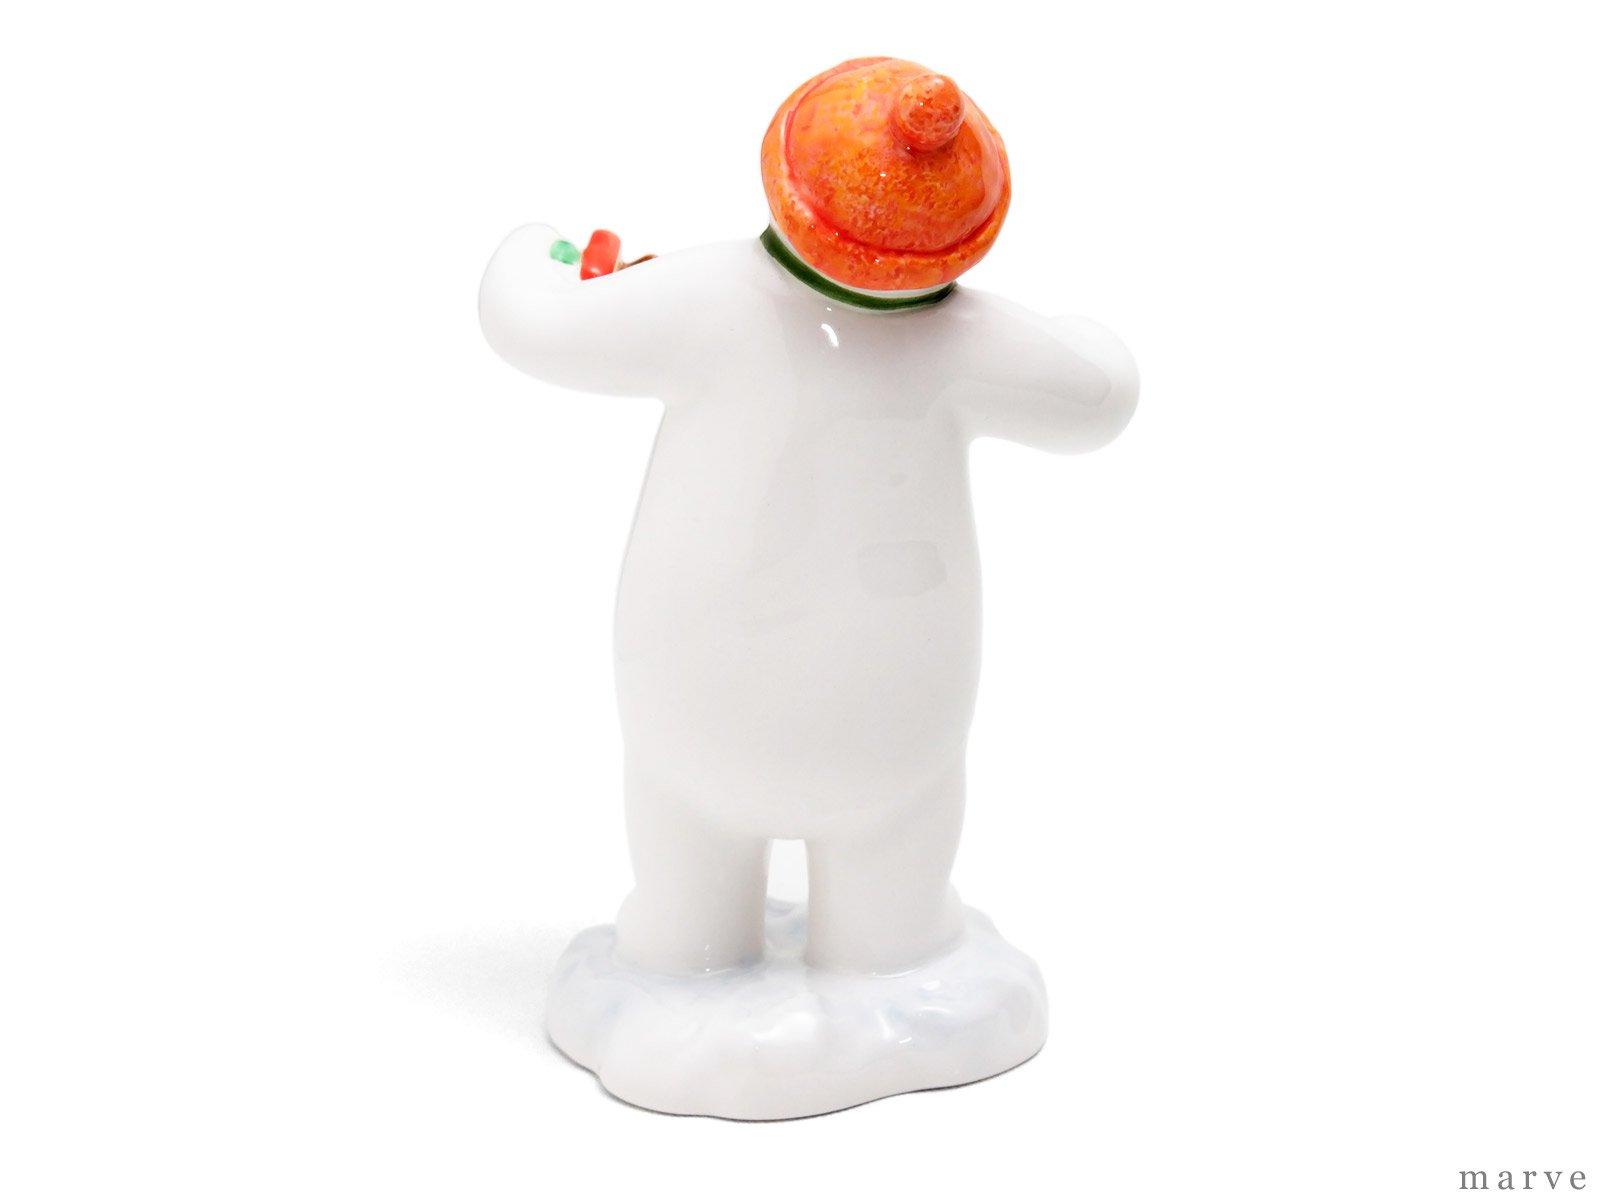 The Snowman フィギュリン アコーディオンスノーマン